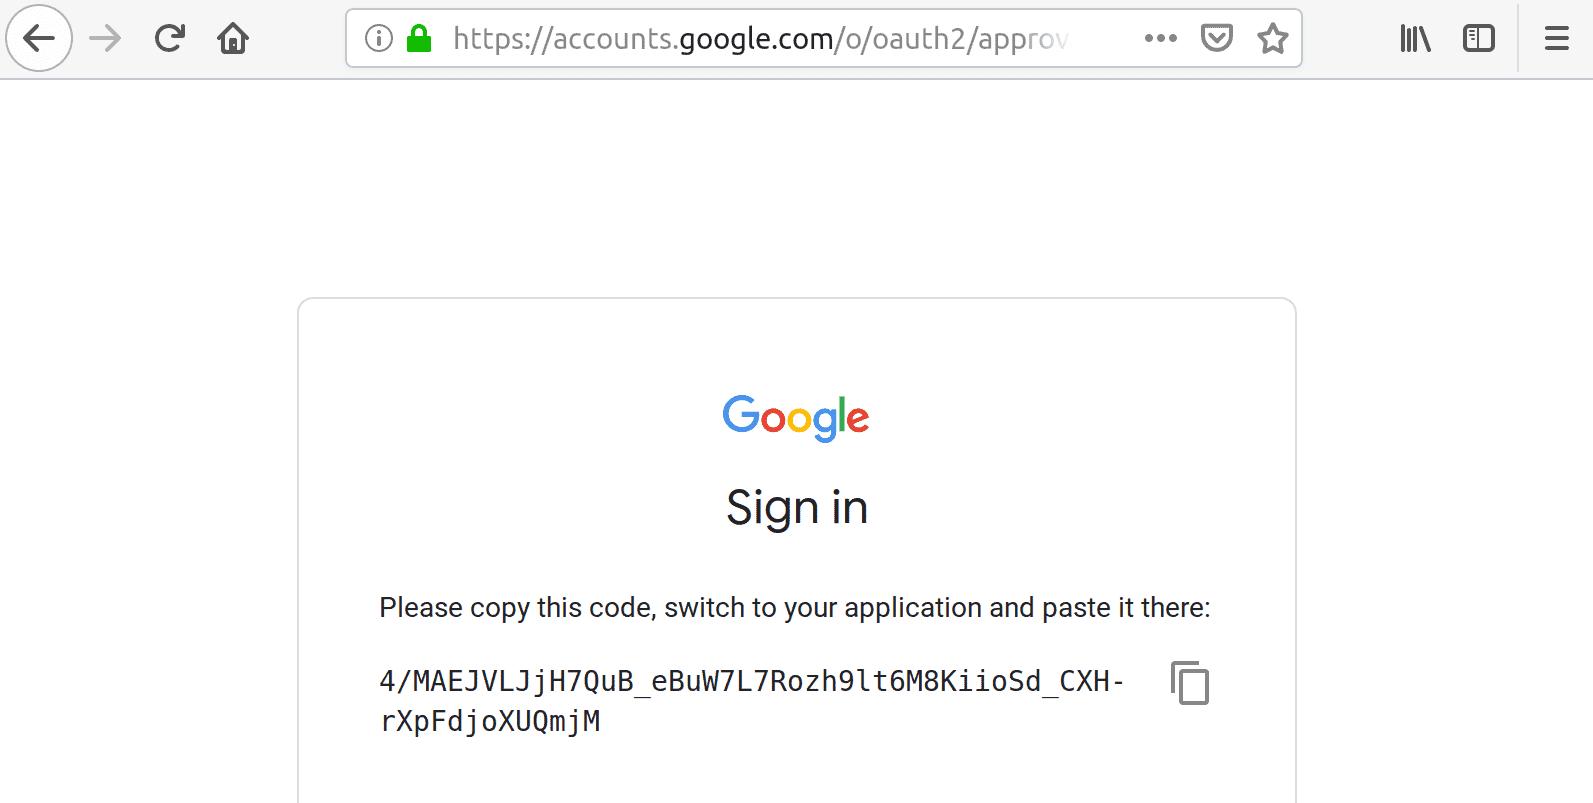 Overgrive Googledrive No Linux 6